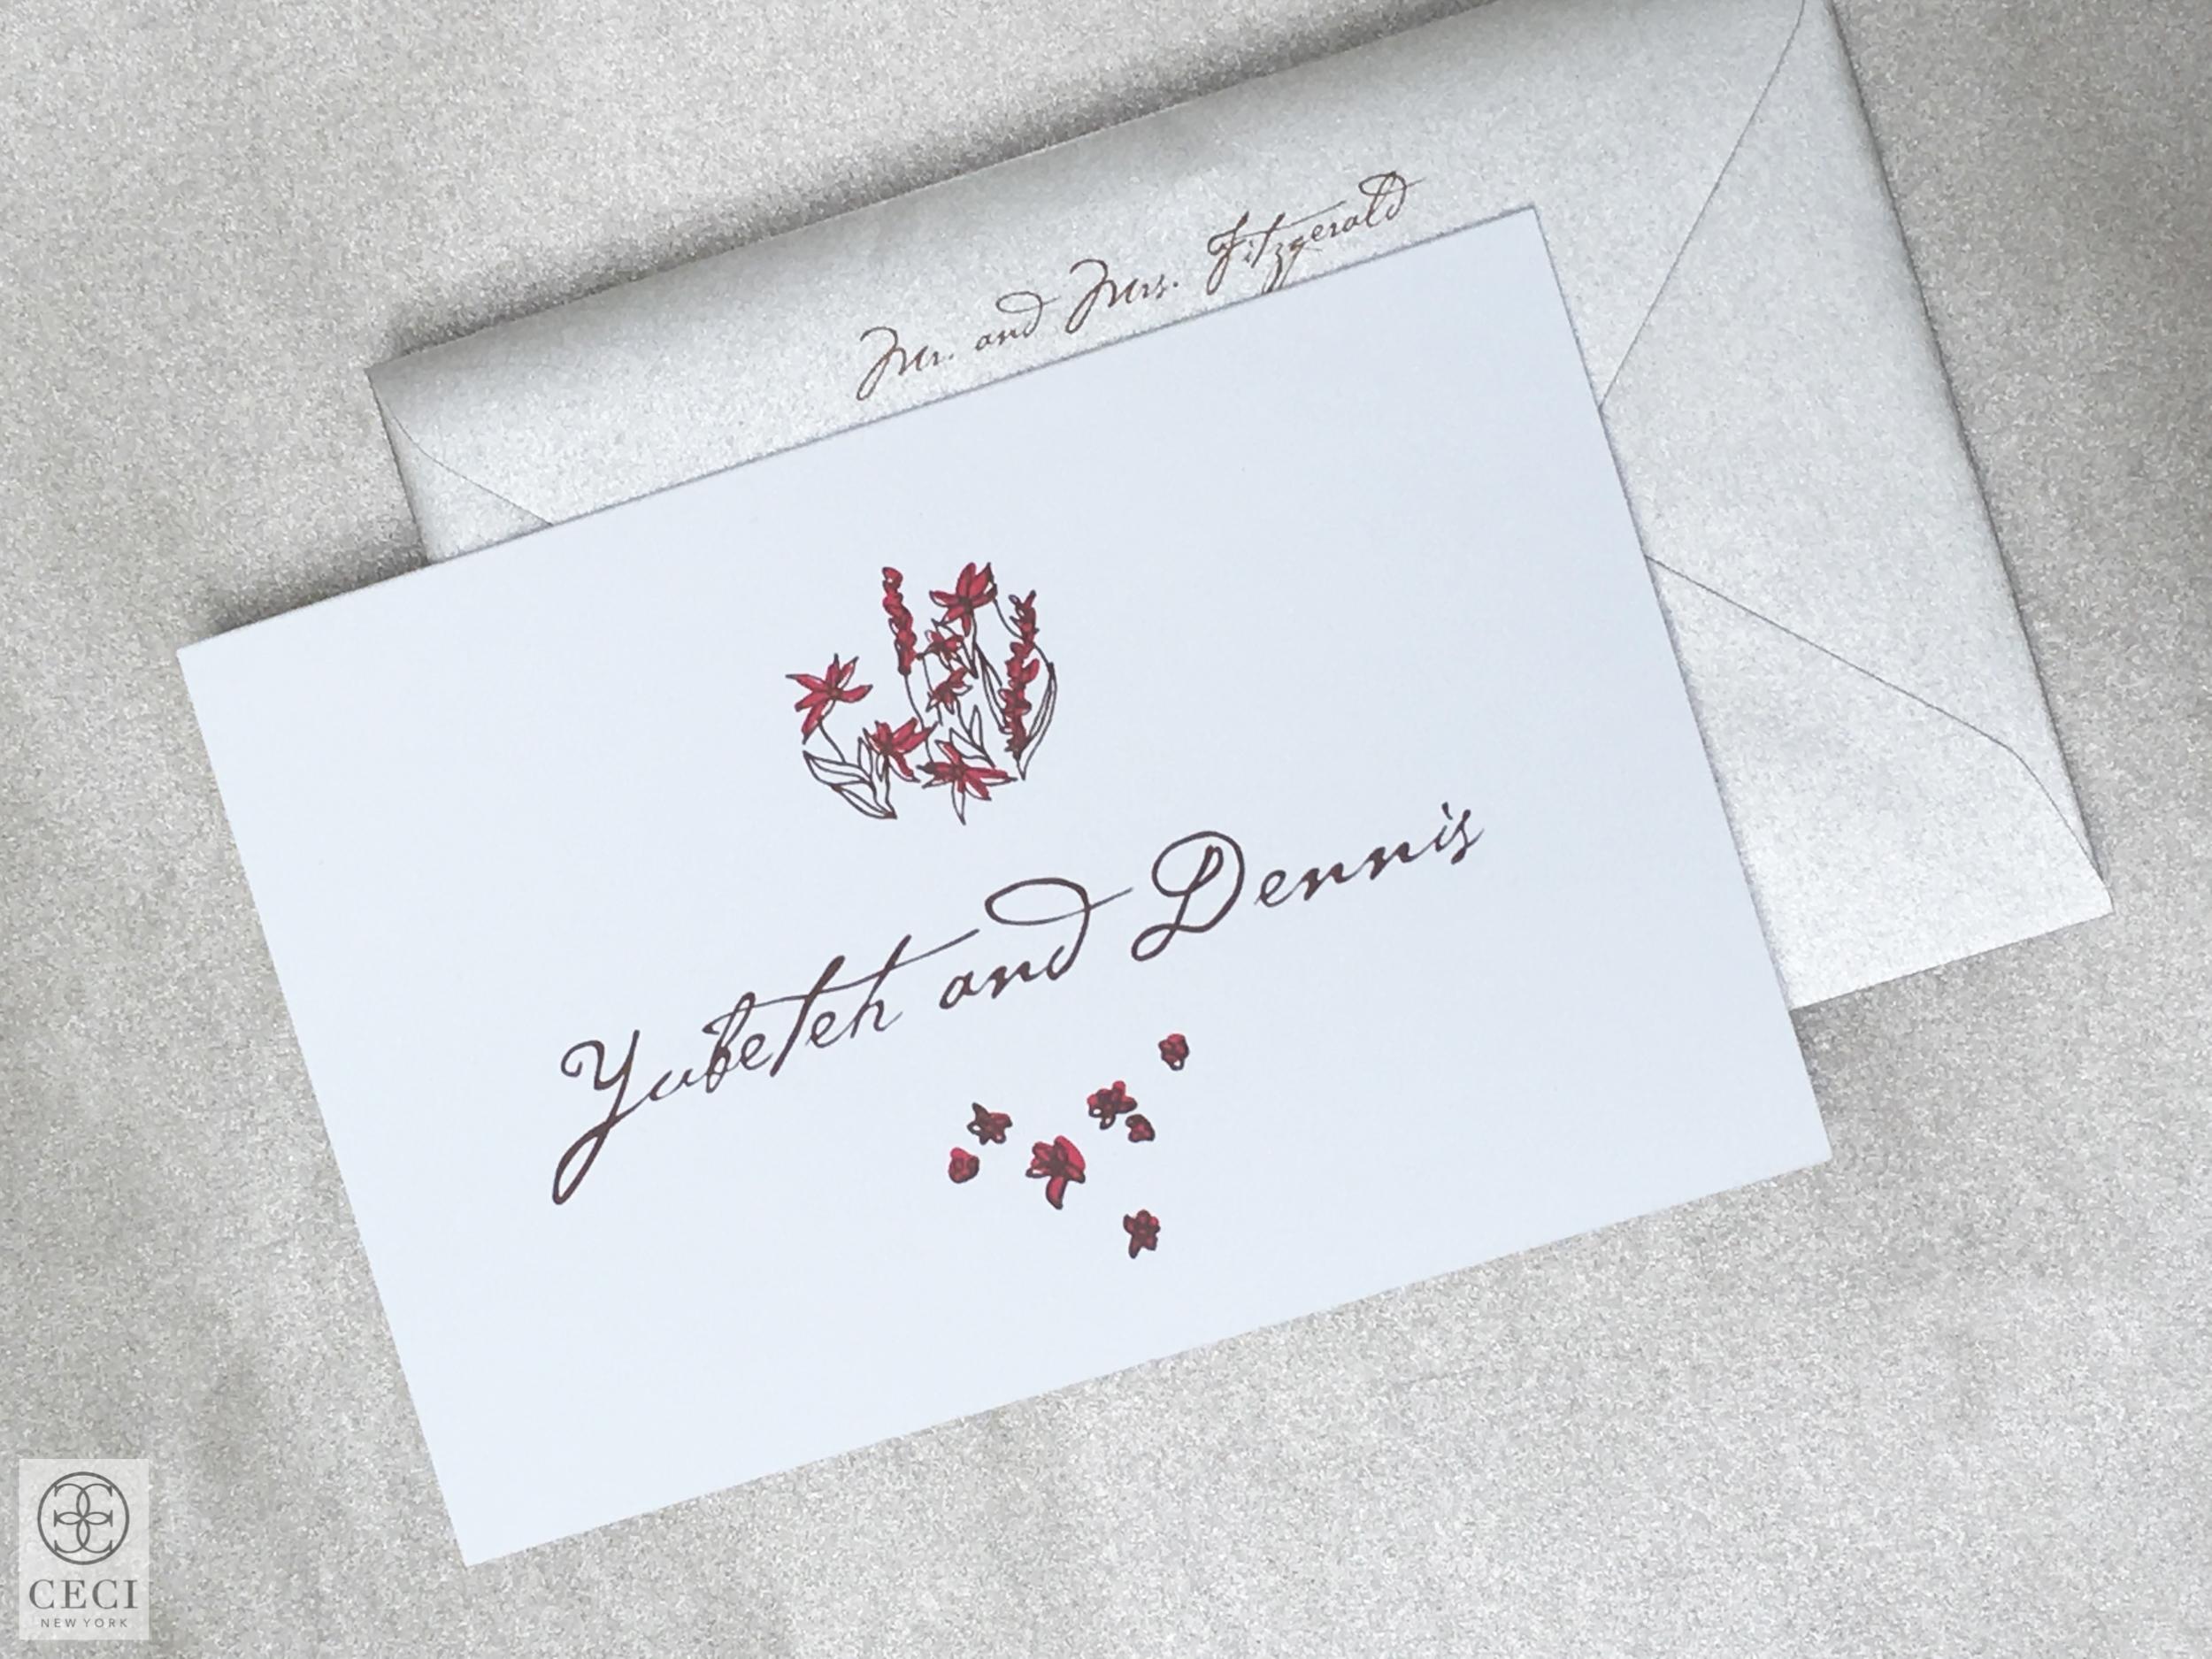 Ceci_New_York_Lyndsey_Hamilton_Events_Invitations_Wedding_Amangani_Elegance_Gold_Foil_Letterpress_Classic_Stamping_Custom_Couture_Personalized-24.jpg